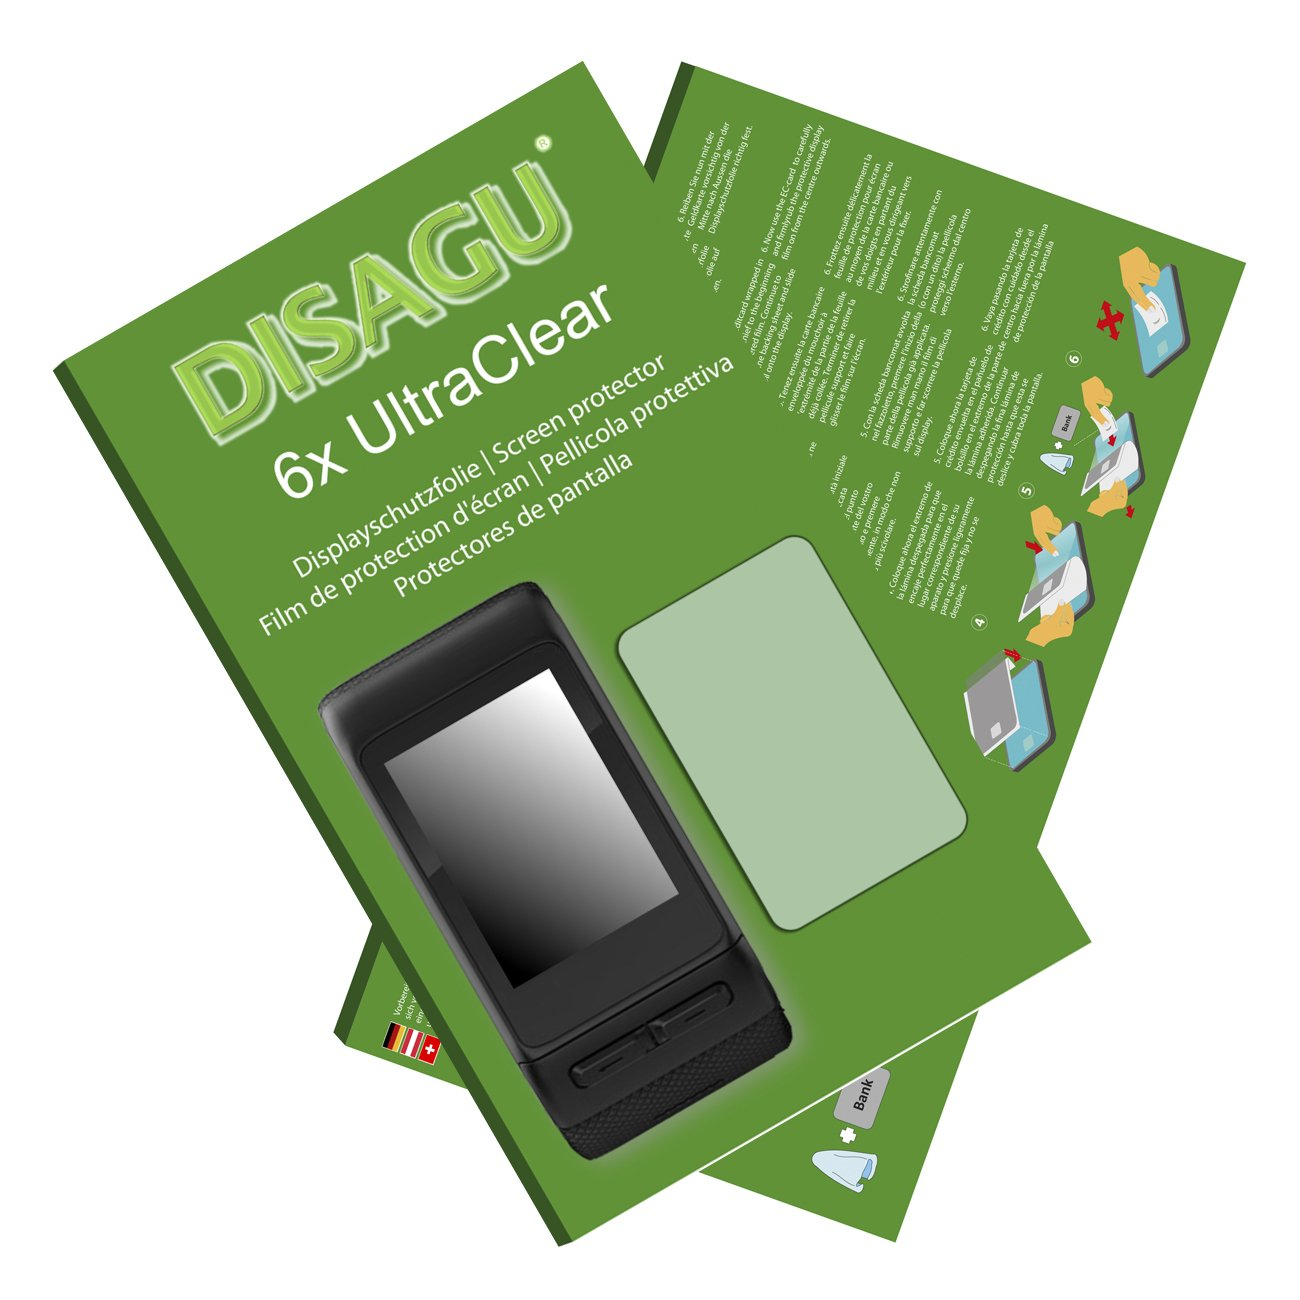 6x Ultra Clear Screen Protector for Garmin vivoactive HR DISAGU #uk6583